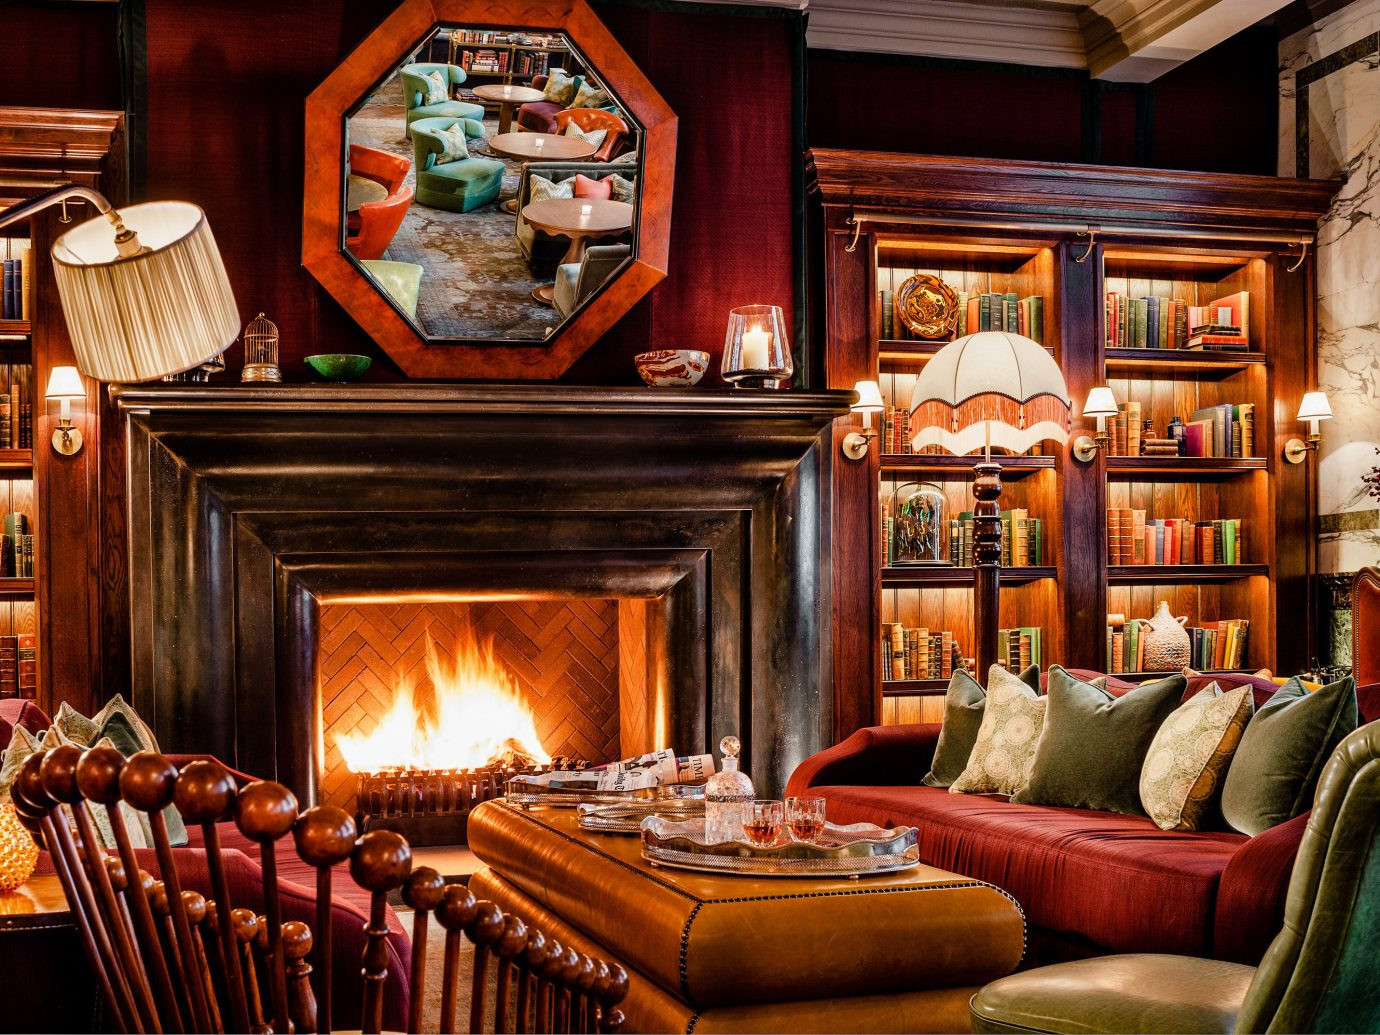 Food + Drink Trip Ideas indoor Living room living room interior design home Fireplace hearth furniture